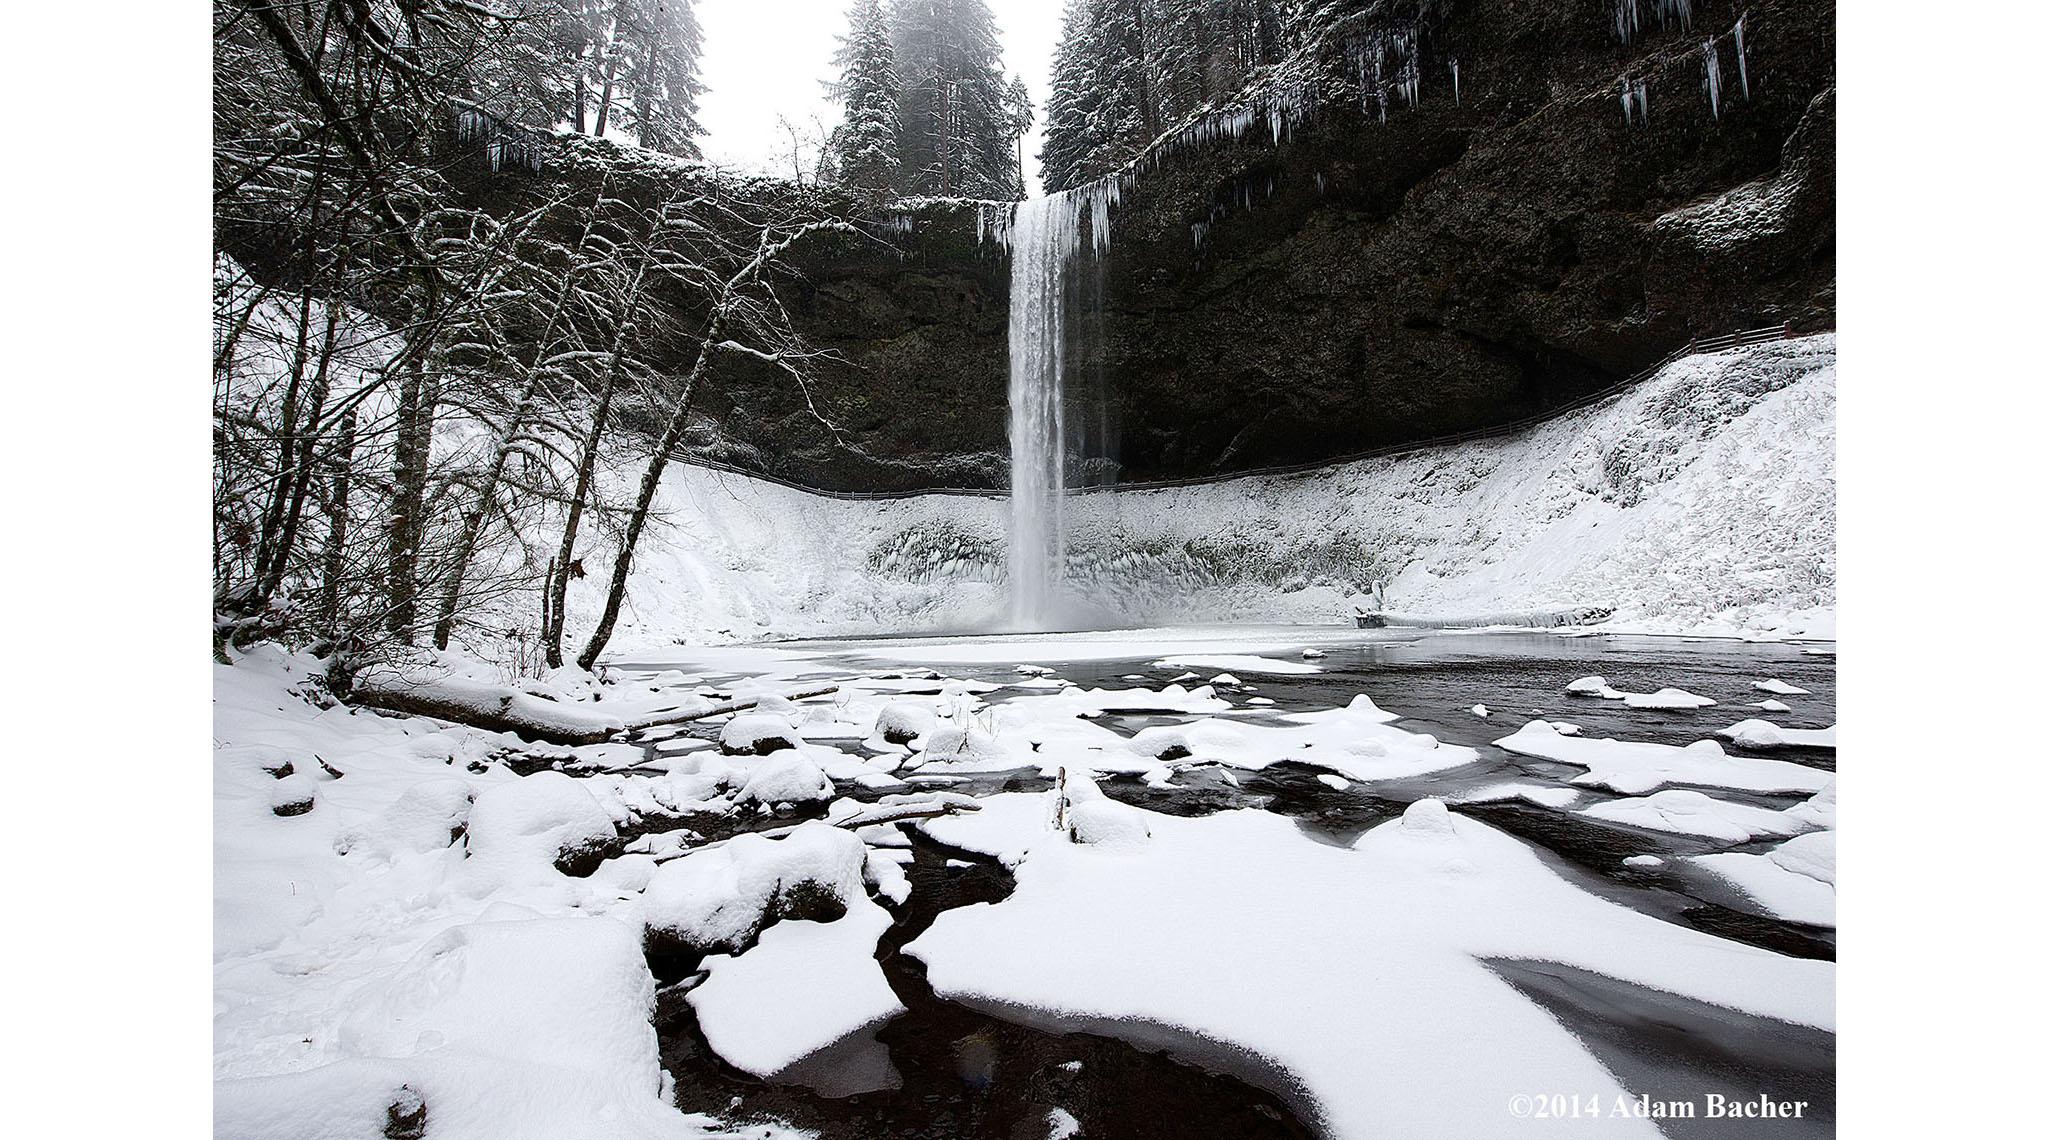 waterfalls at silver falls state park oregon